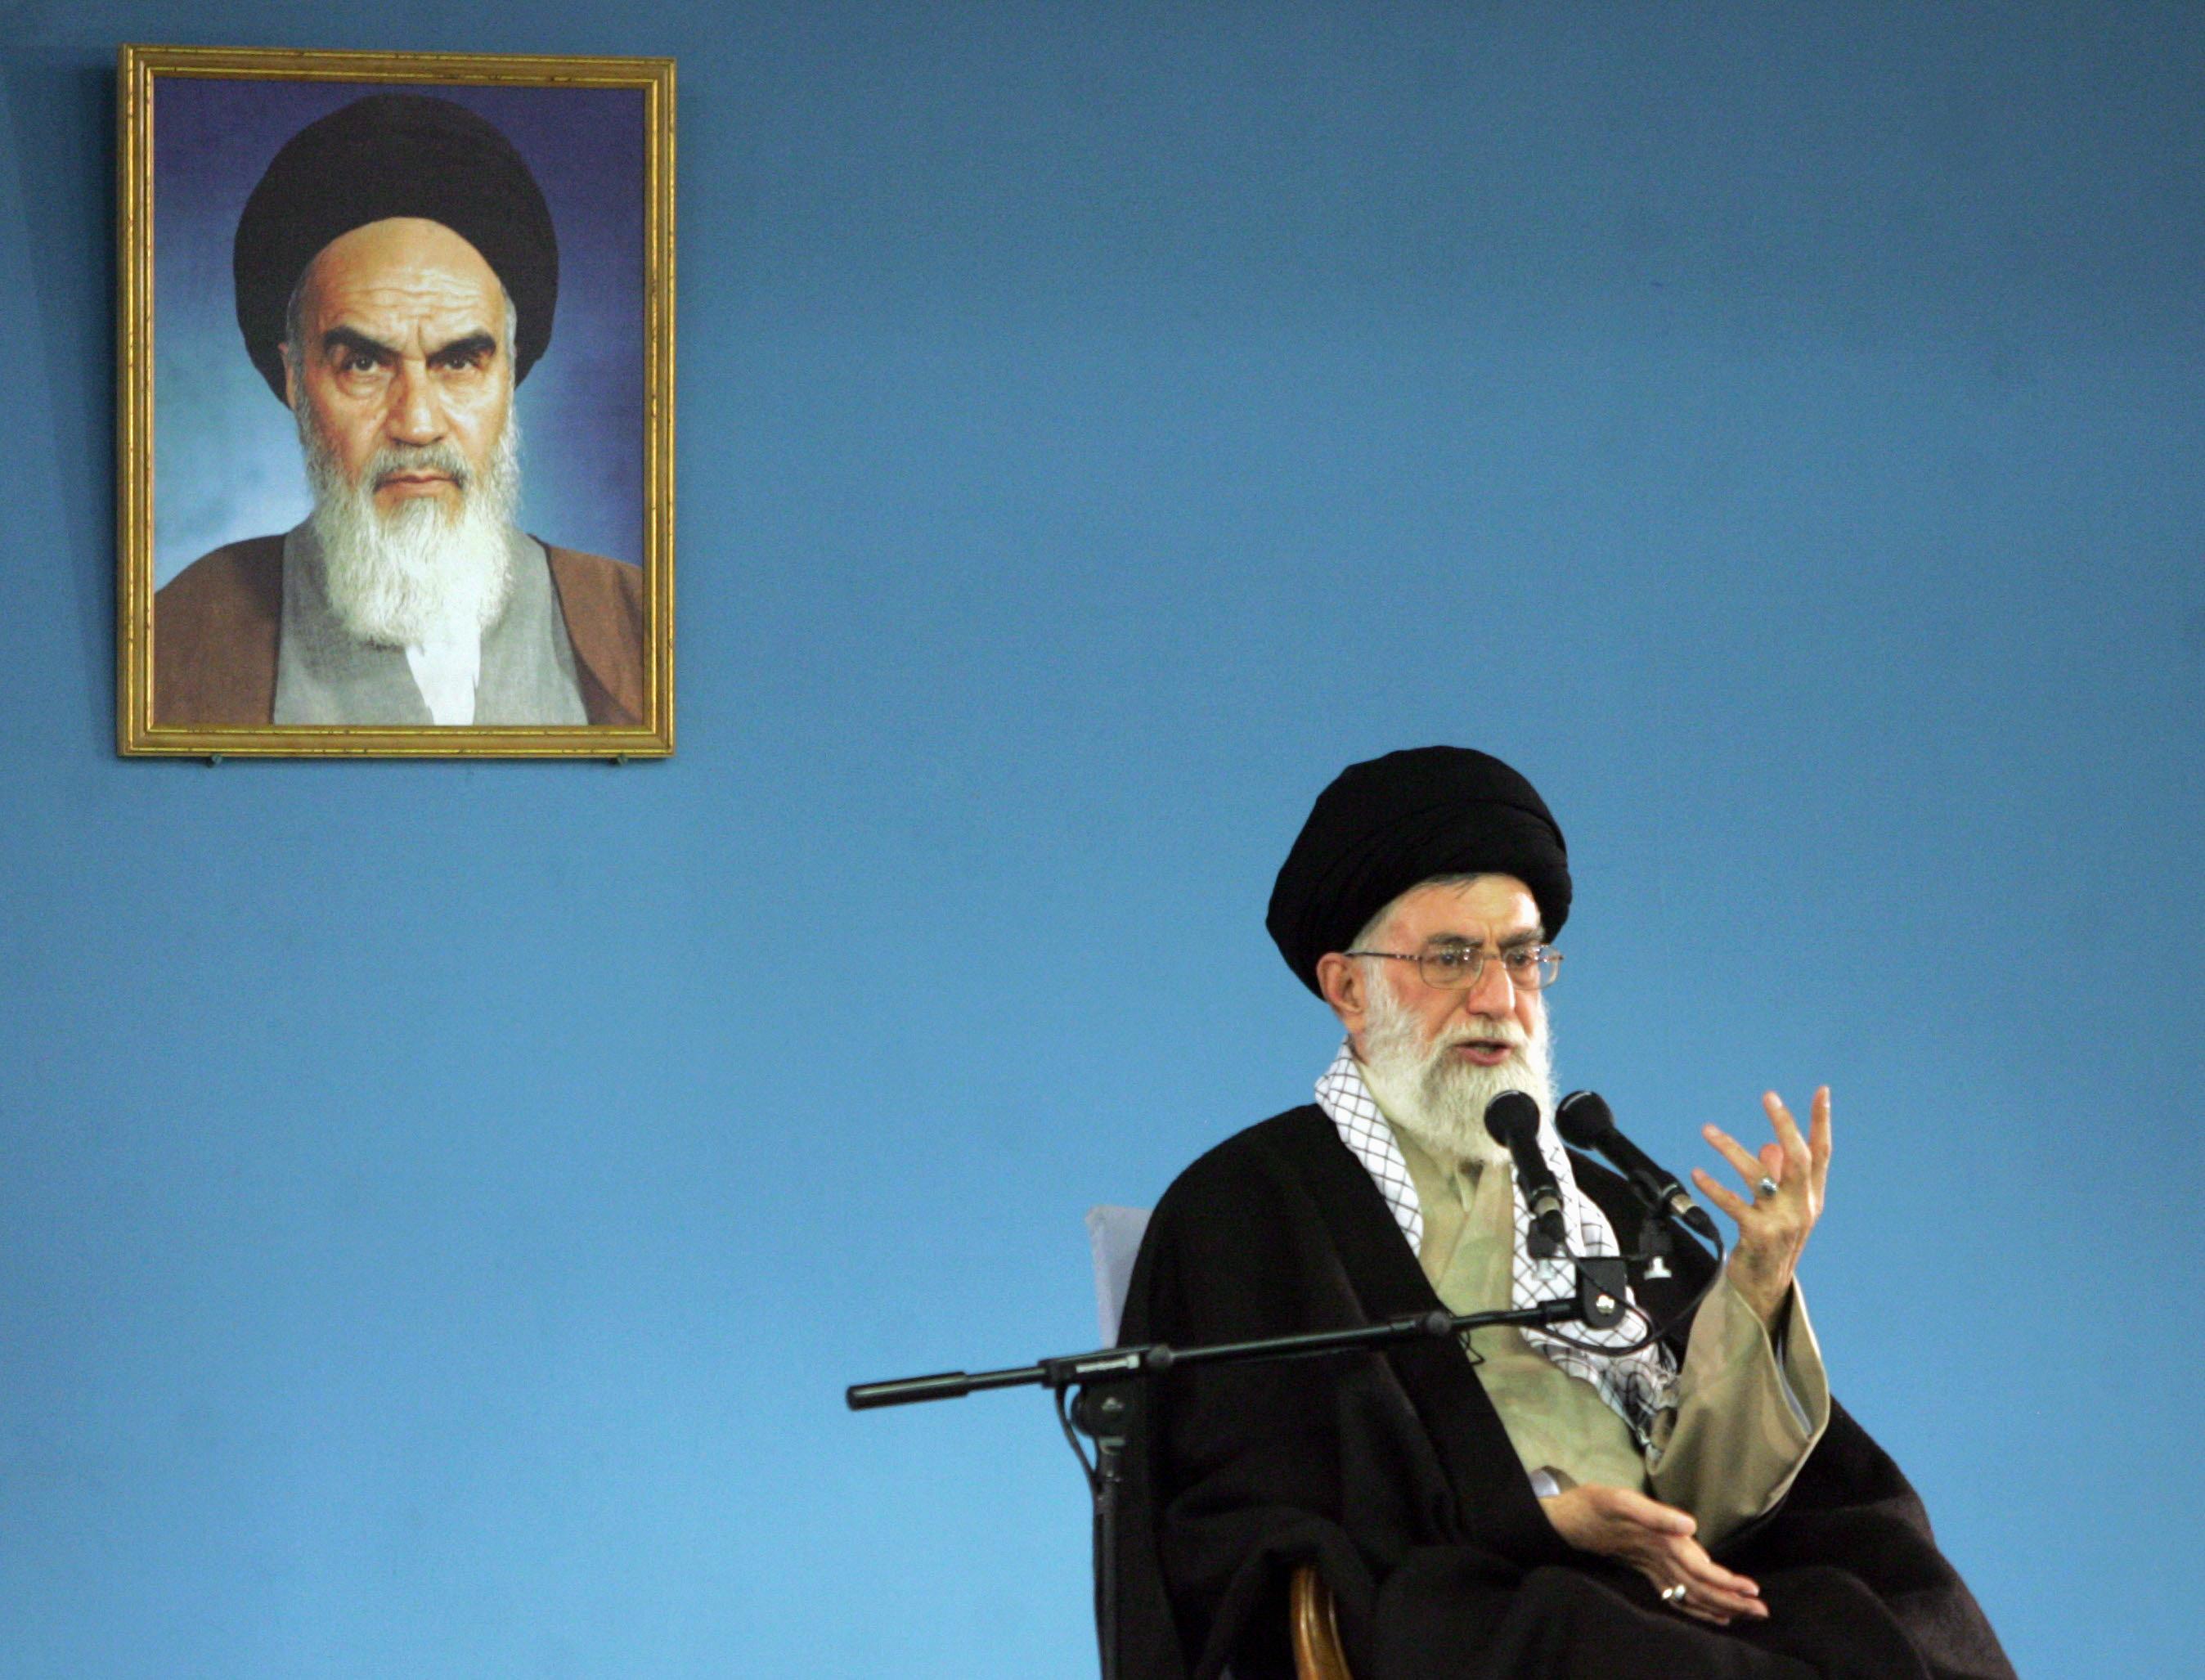 Iranian supreme leader Ayatollah Ali Kha